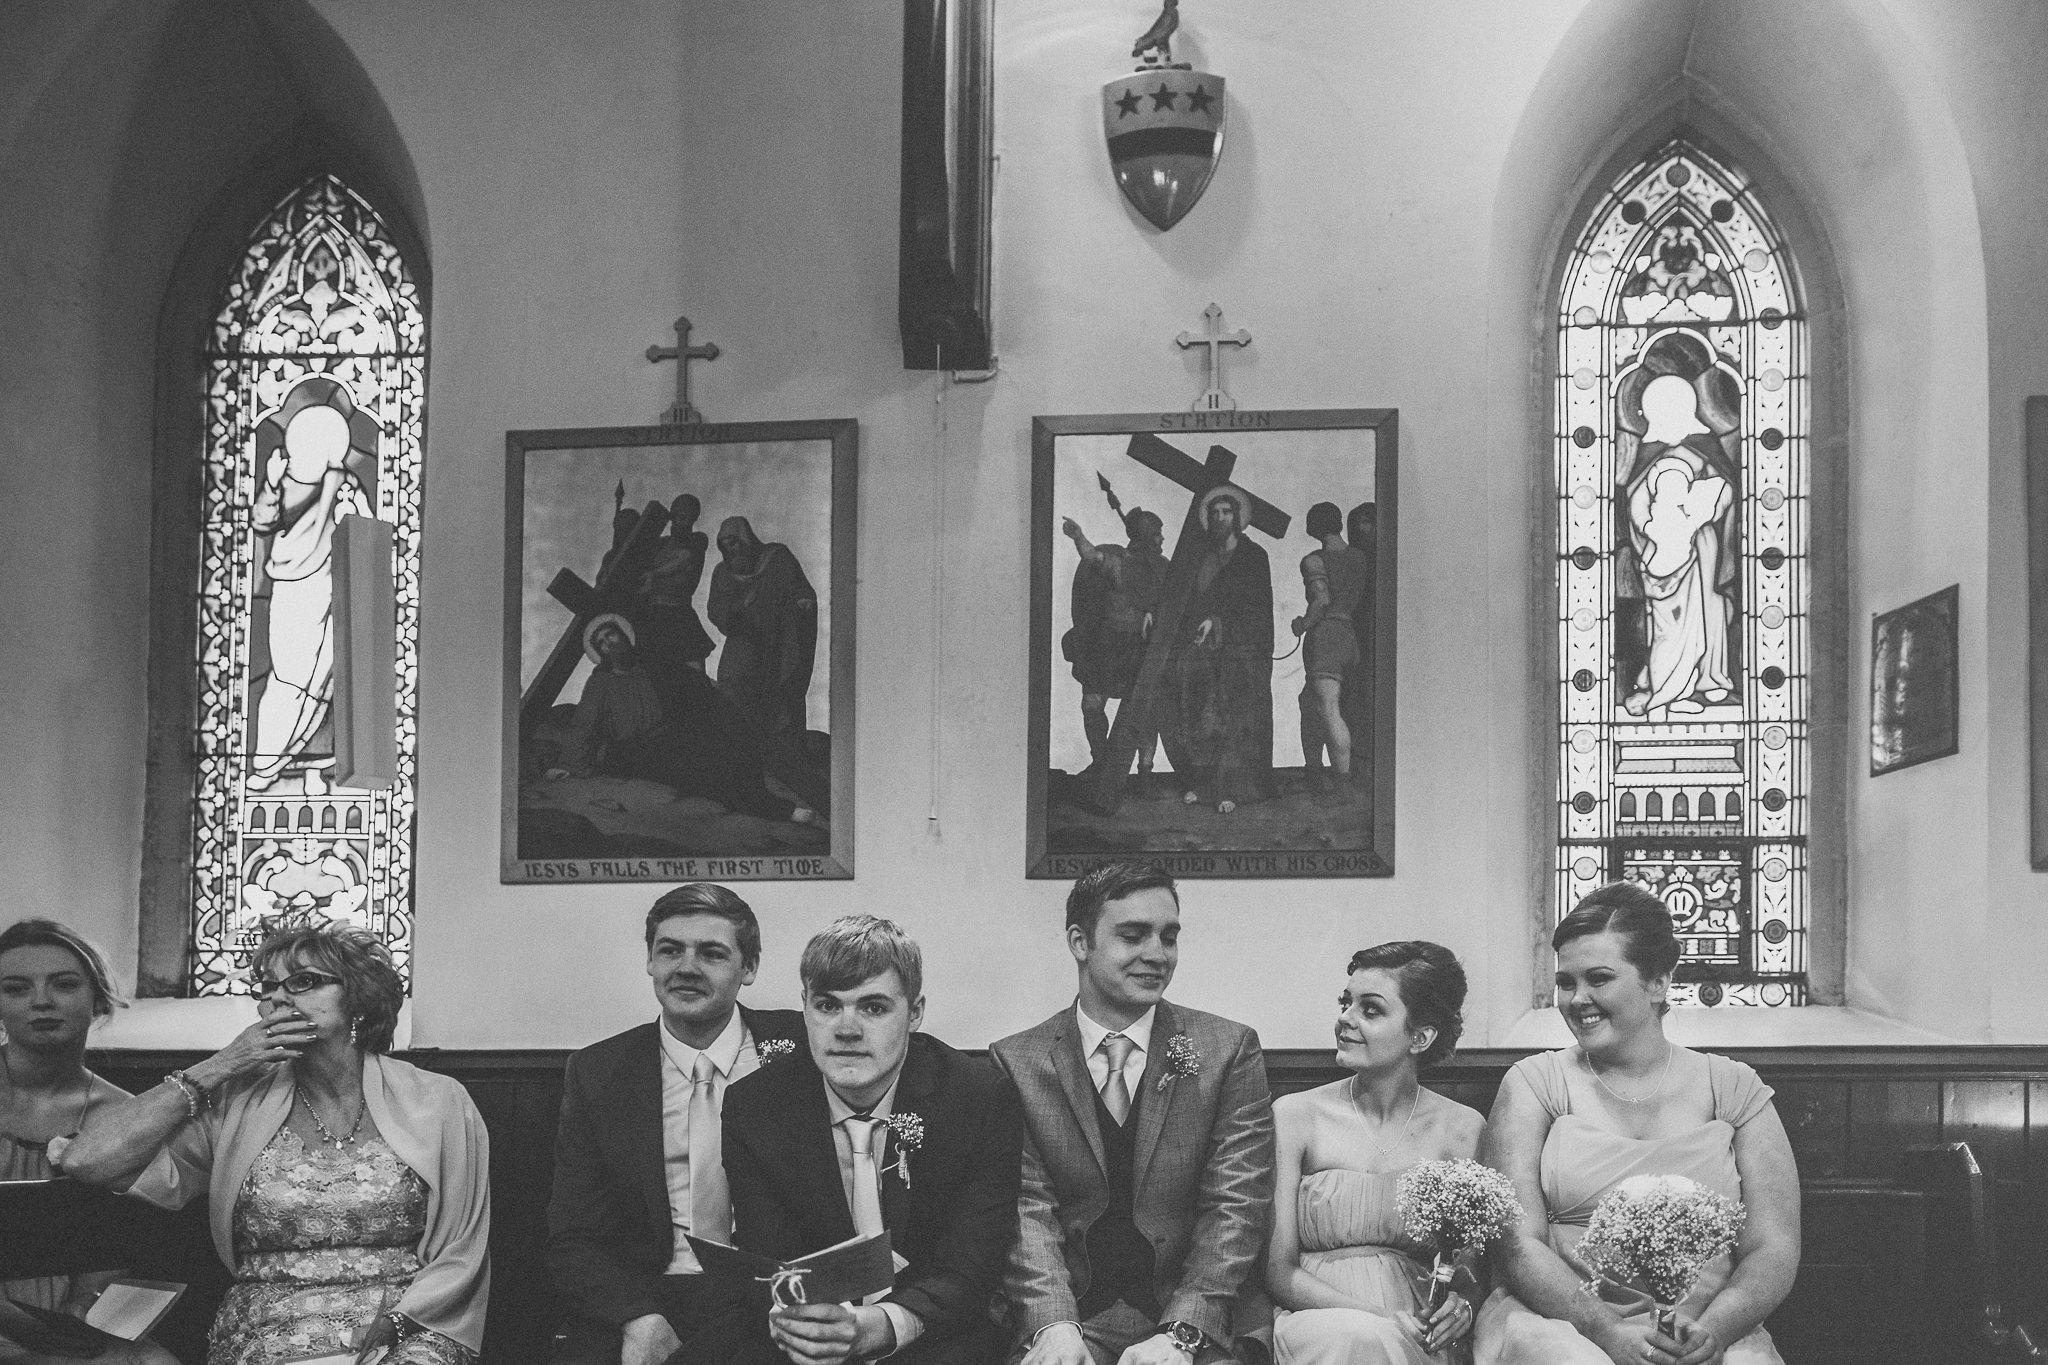 Lancashire-Creative-natural-documentary-wedding-photography-90035